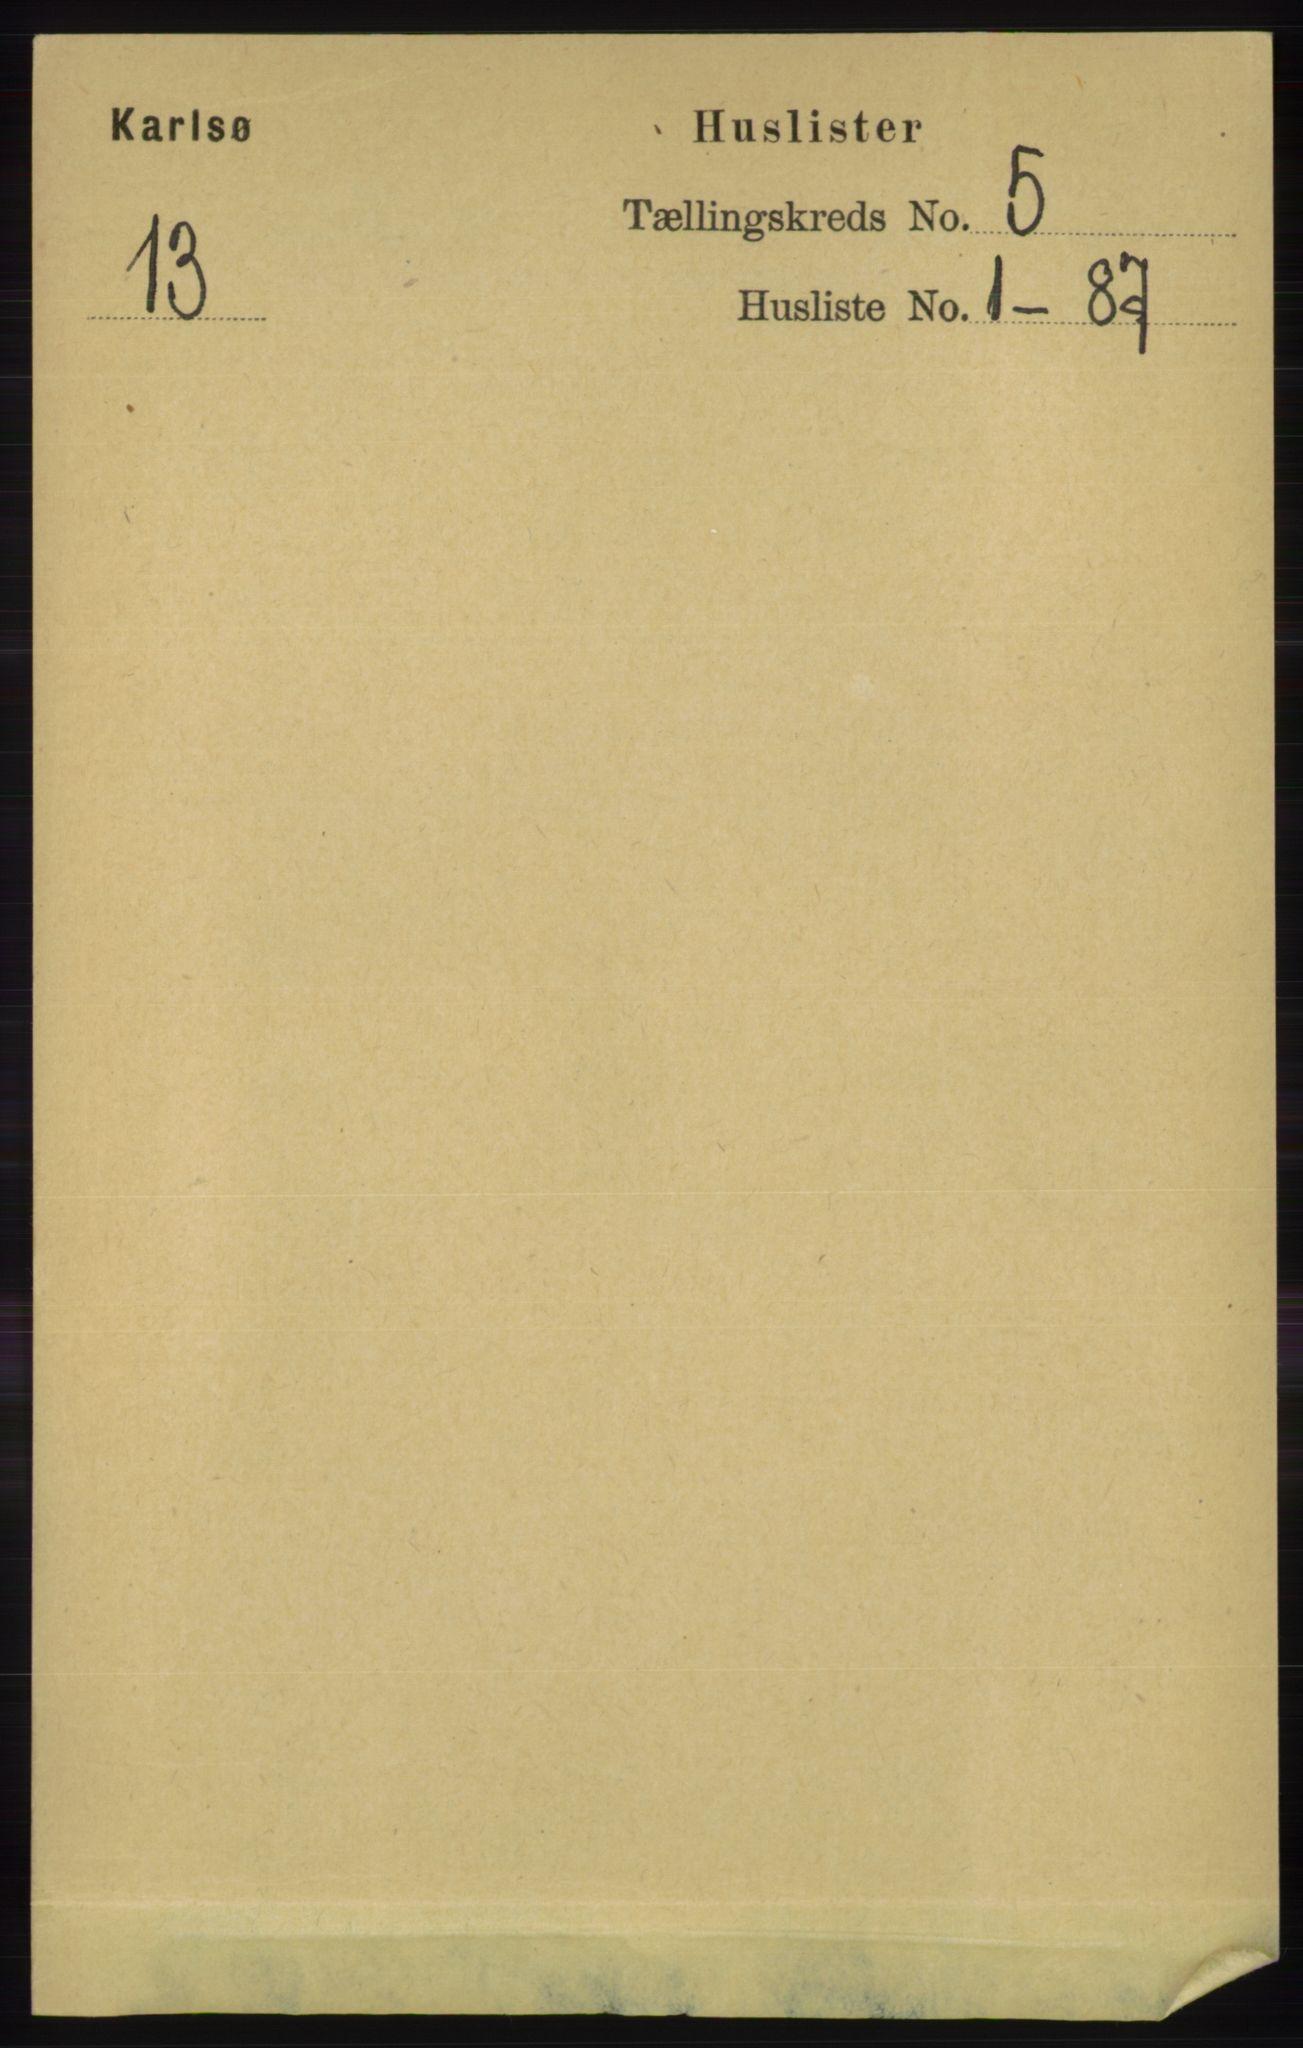 RA, Folketelling 1891 for 1936 Karlsøy herred, 1891, s. 1228